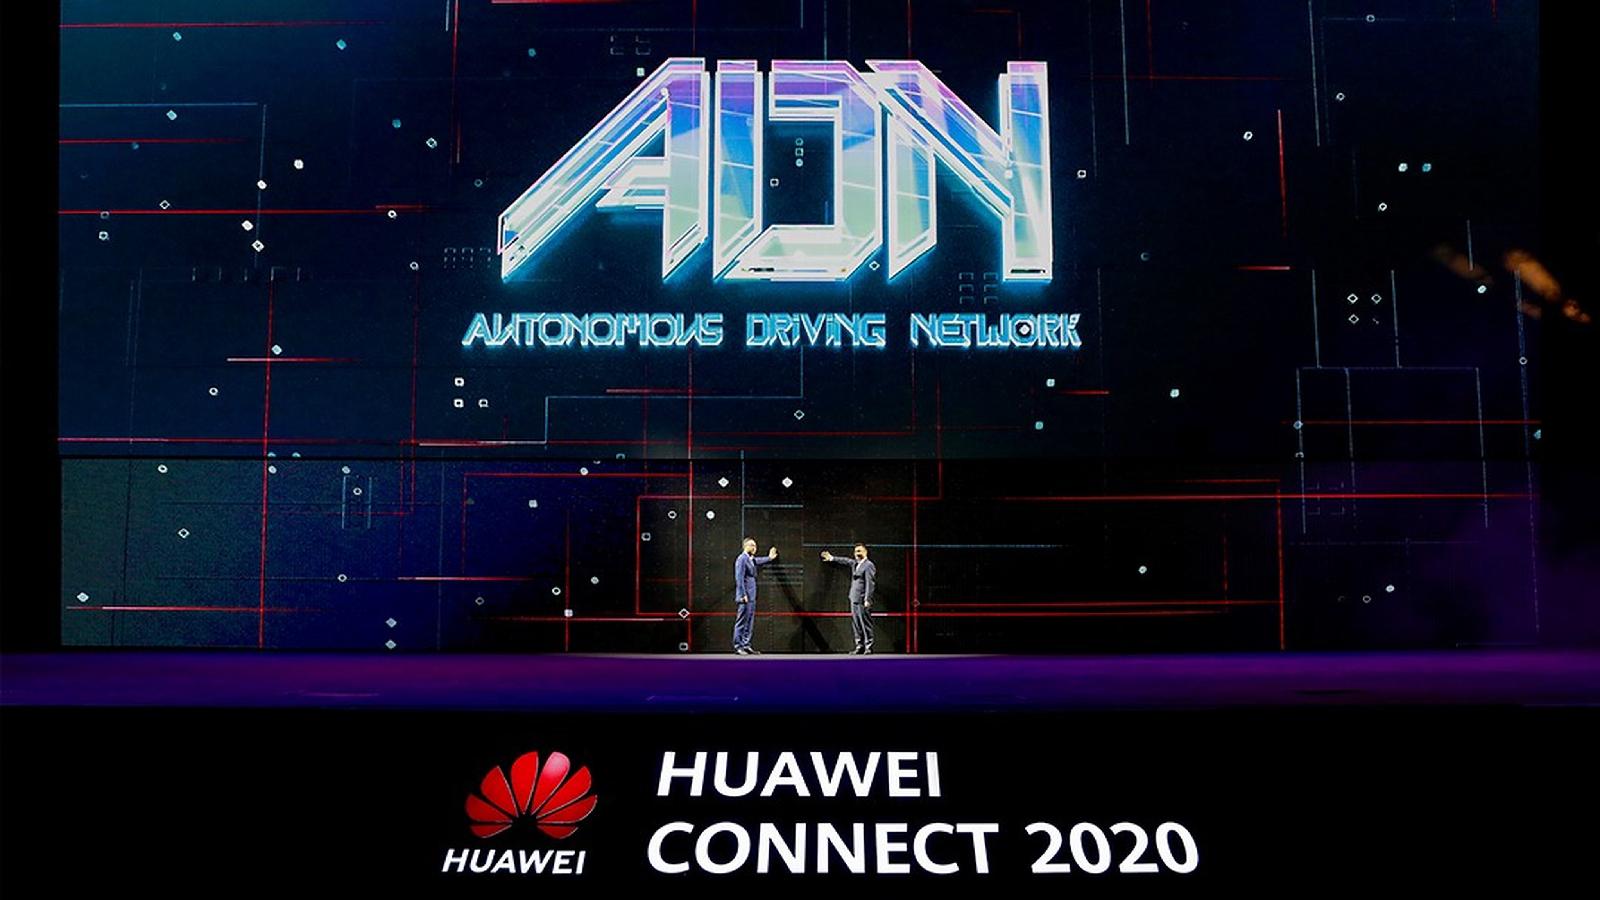 Huawei เปิดตัวโซลูชันโครงข่ายระบบขับขี่อัตโนมัติสำหรับองค์กรสร้าง Intelligent Twins สำหรับภาคอุตสาหกรรมด้วยการเชี่อมต่ออัจฉริยะ